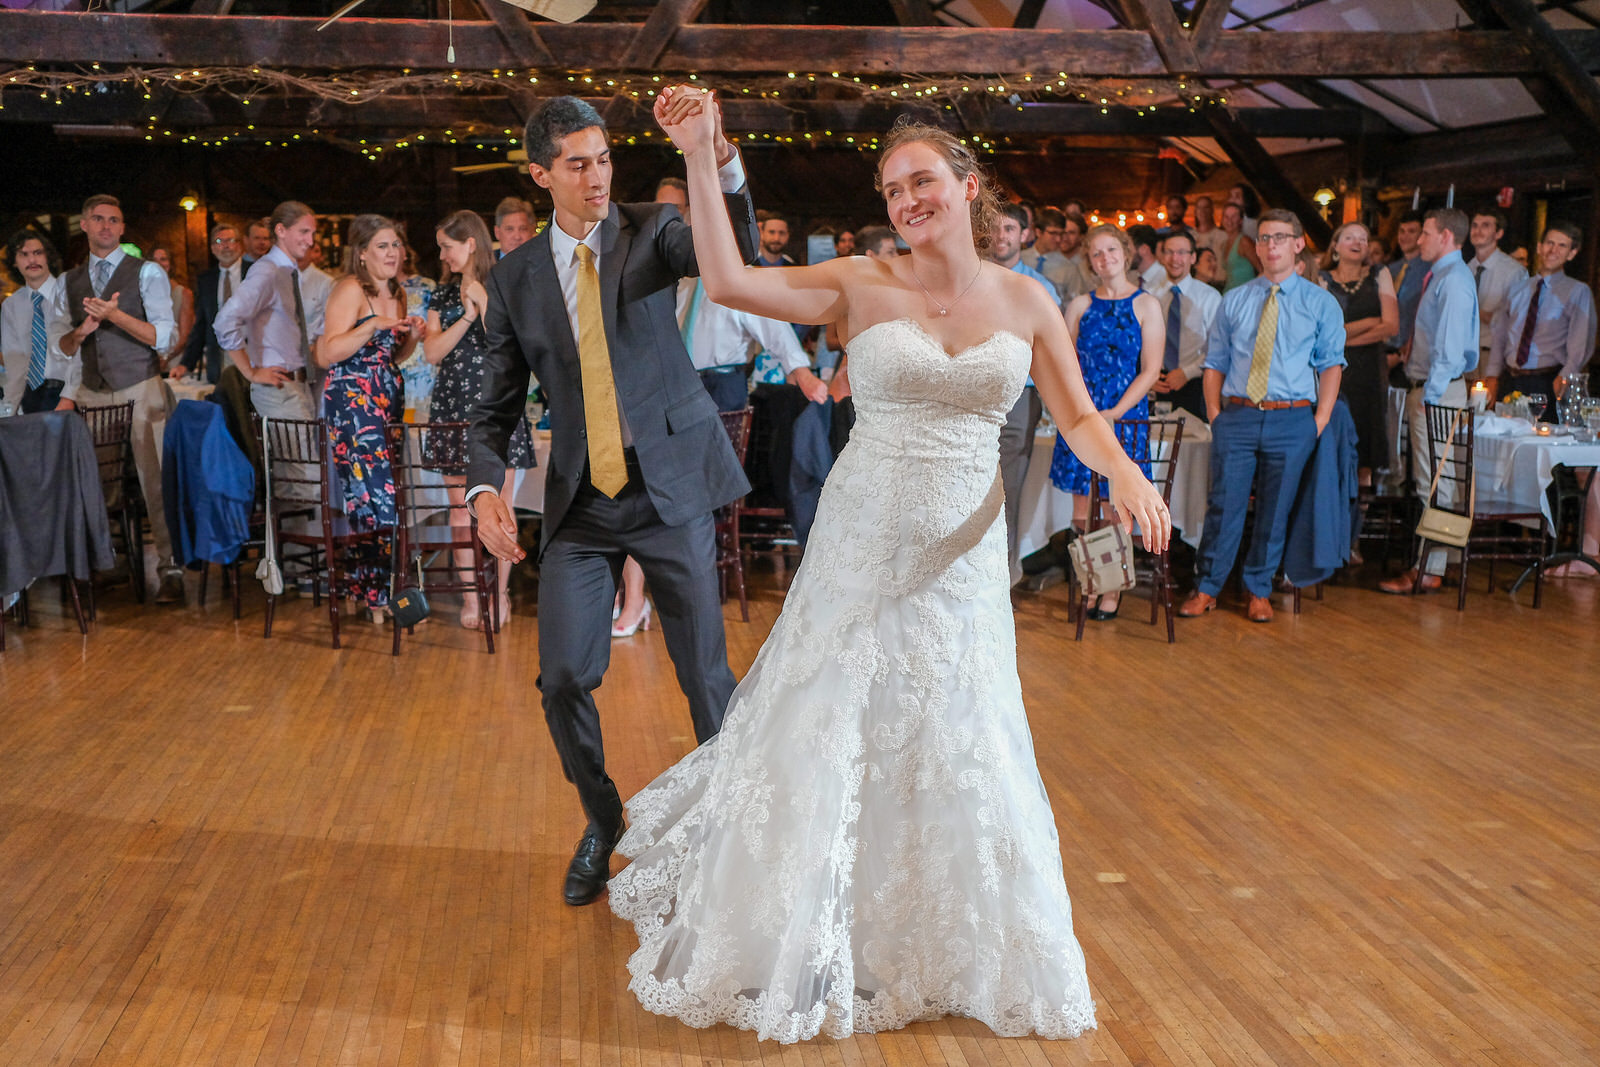 candid-vermont-wedding-photography-1067.jpg